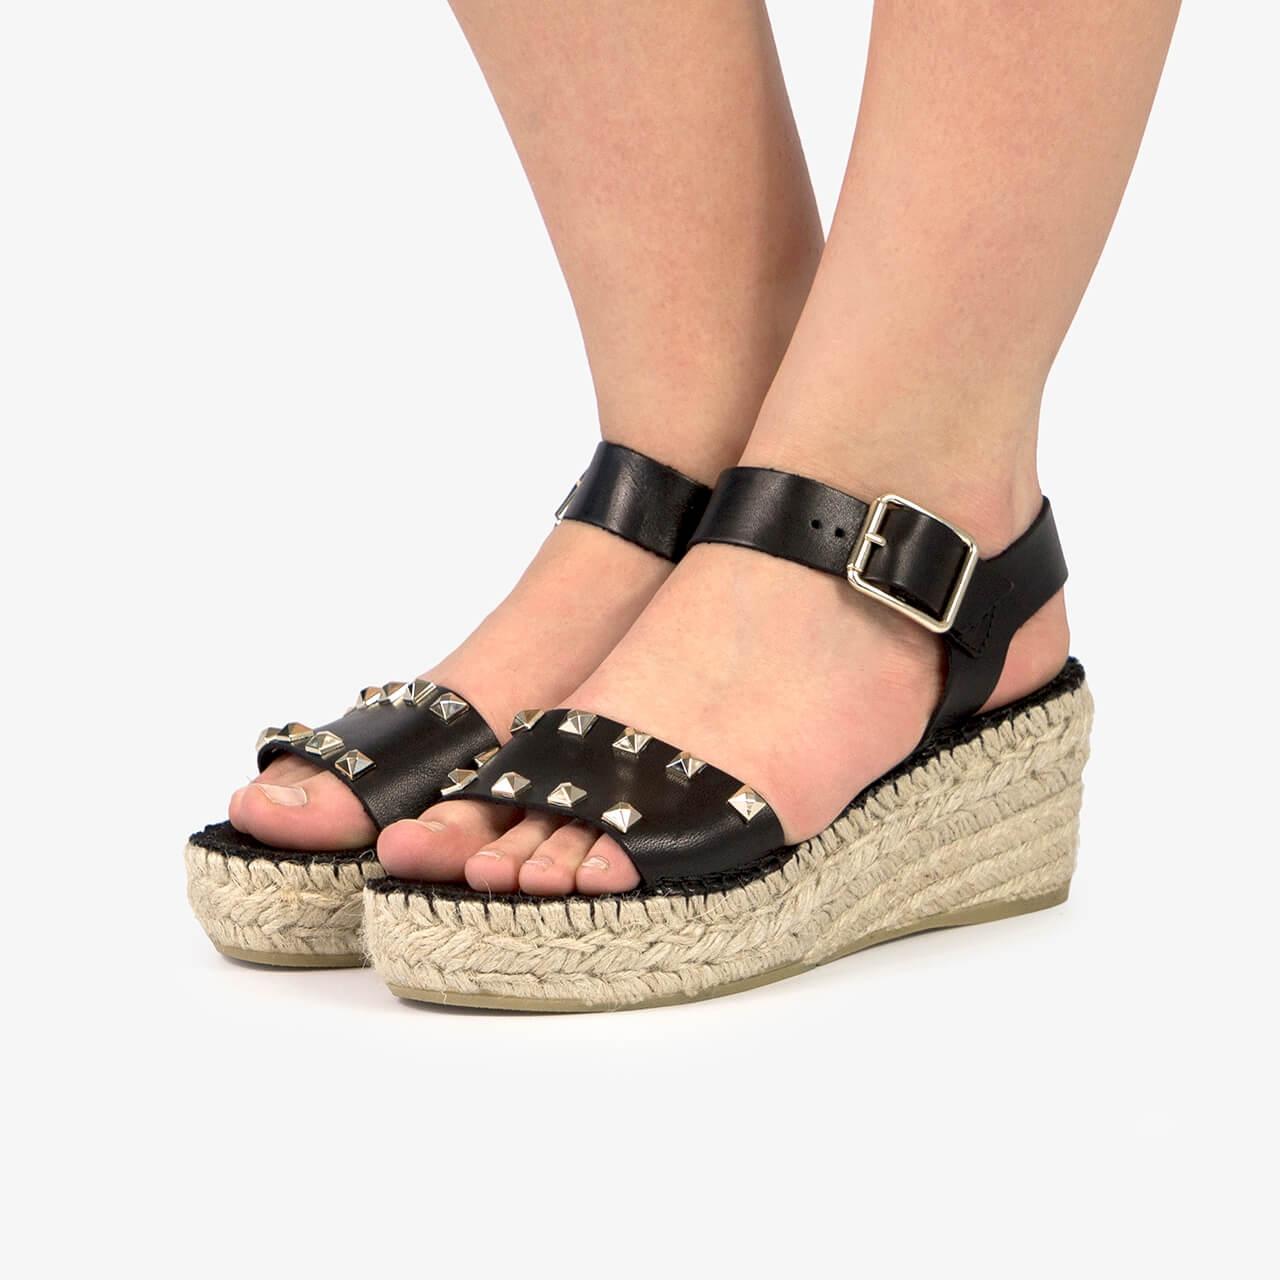 sandalias cuña - Ítem3